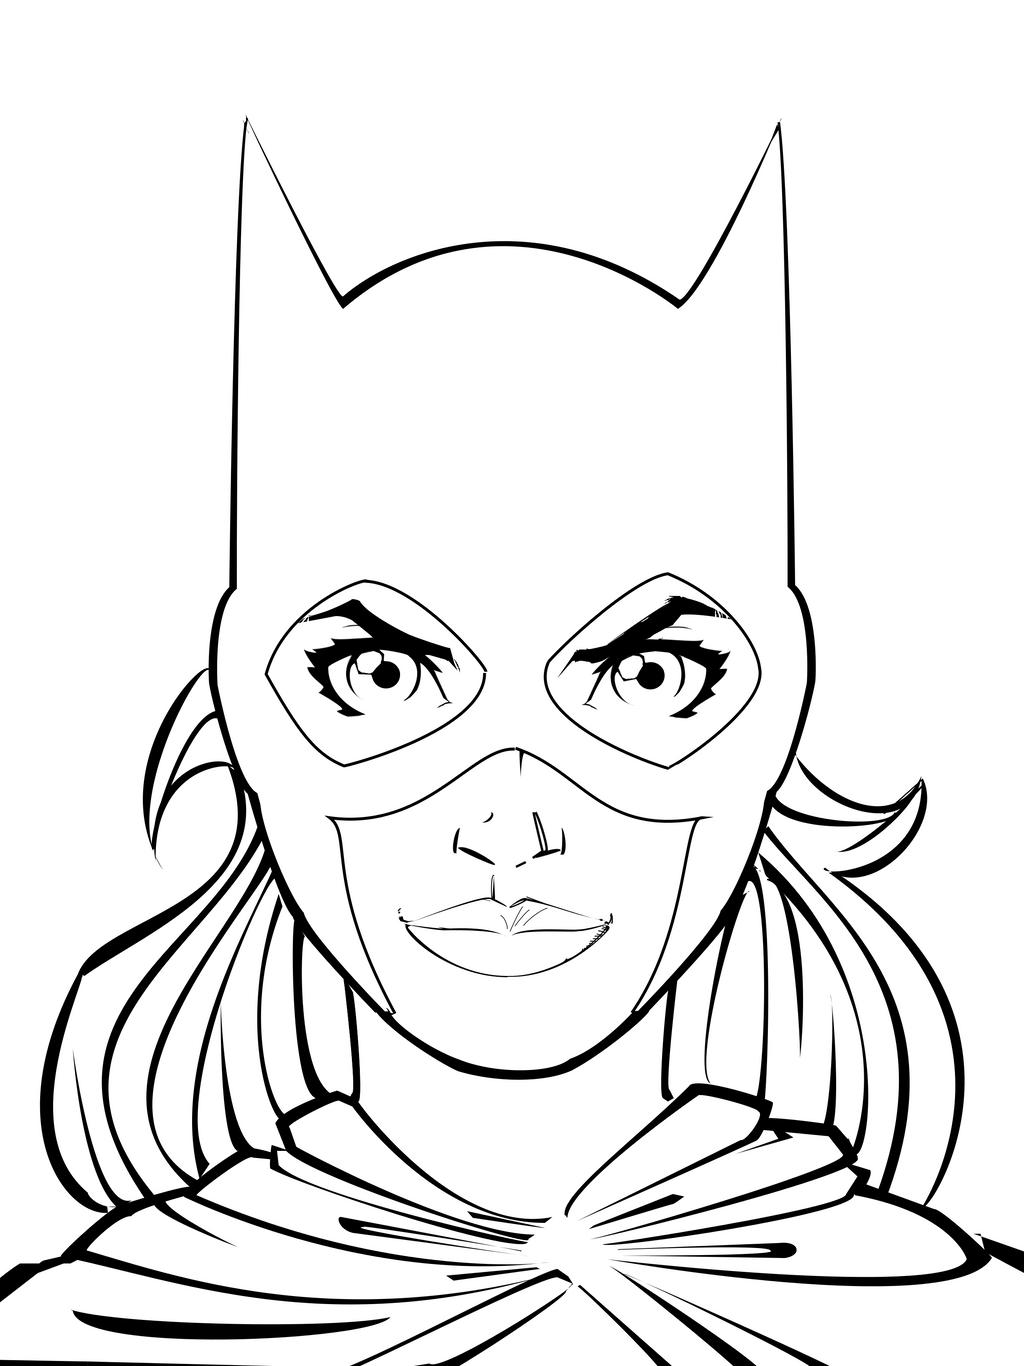 Superhero Batman Batmobile Coloring Sheets Printable Kids: Batman Coloring Pages